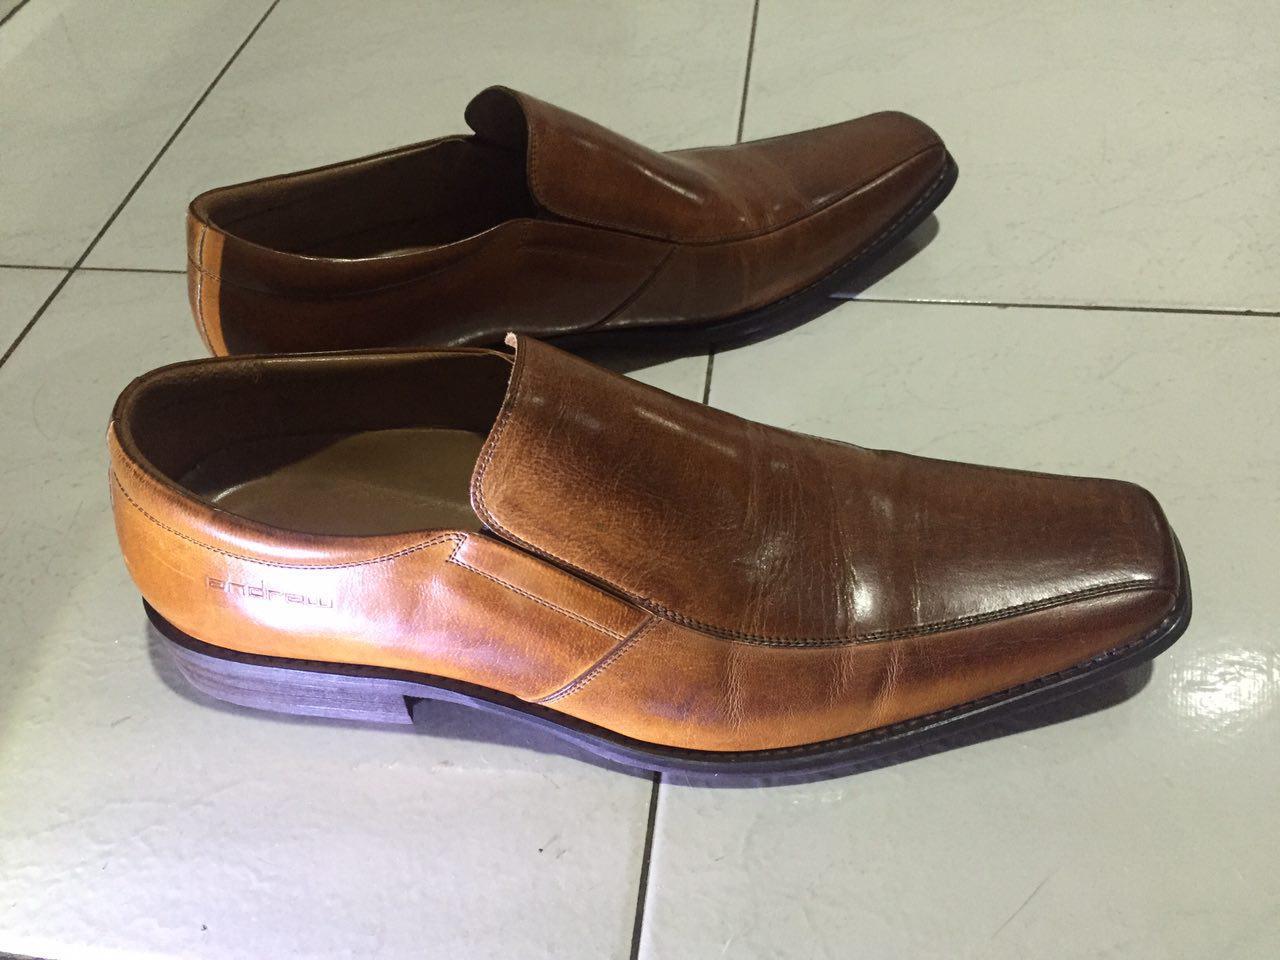 ALL ABOUT Dress Shoe/Sepatu Formal - Page 24 | KASKUS